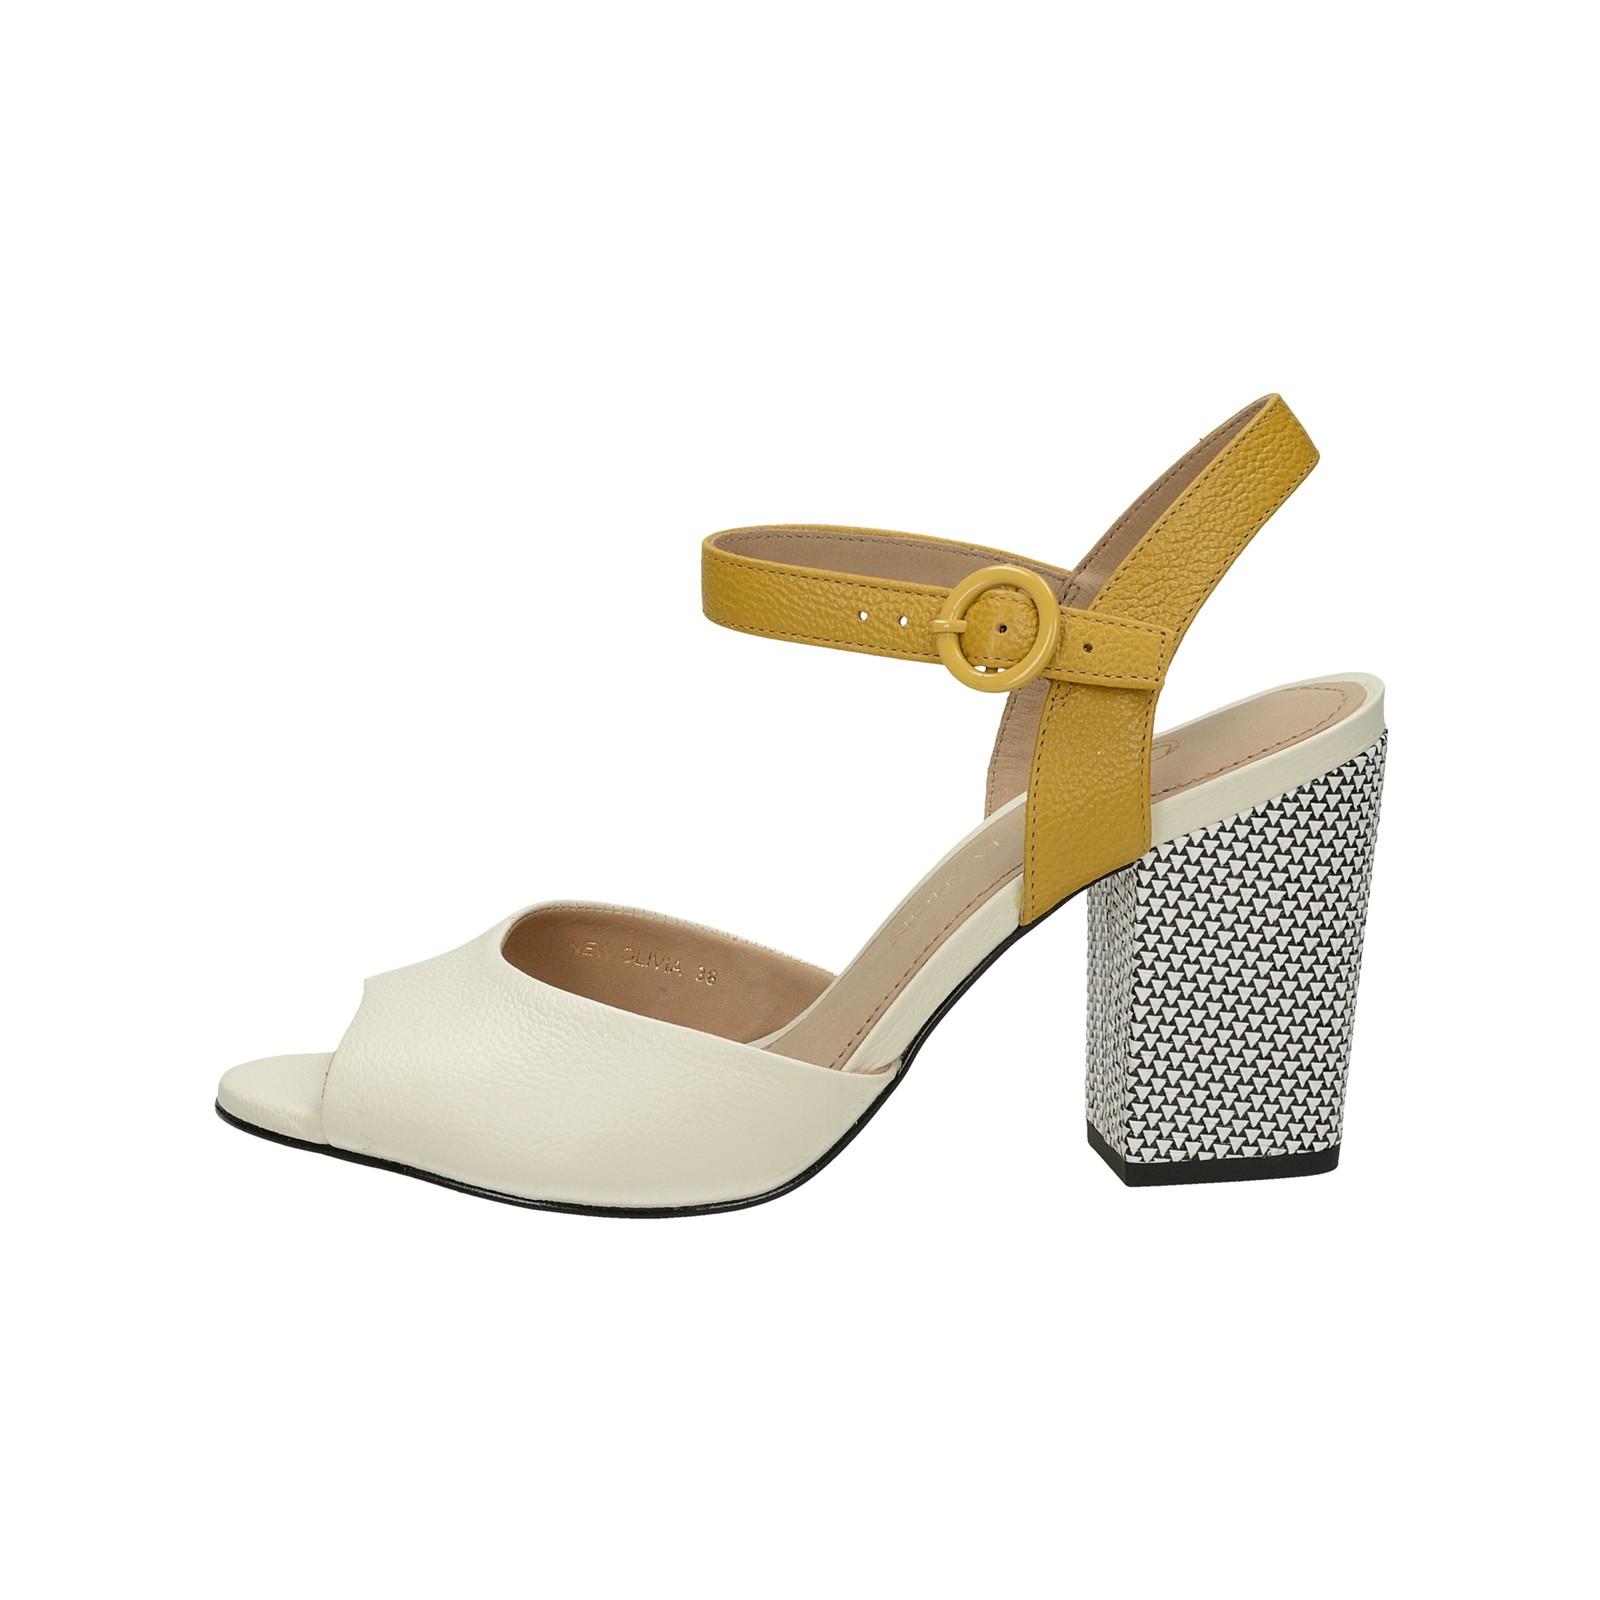 ... Olivia shoes dámske štýlové sandále s remienkom - béžové ... c2339a17aac